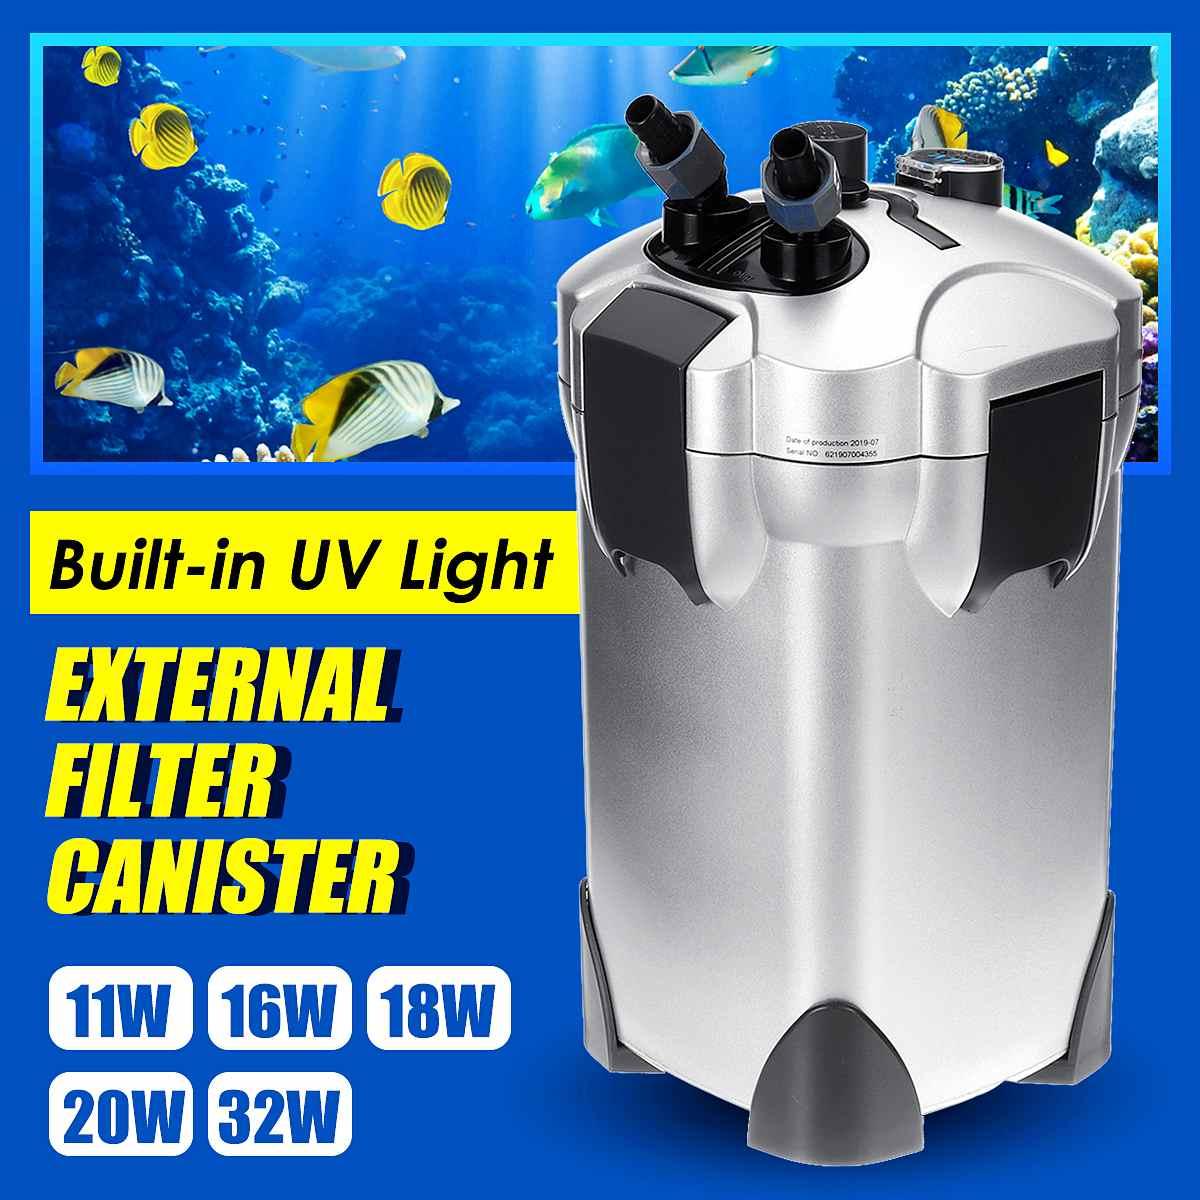 Aquarium Filter Purifier Sterilizer Fish Tank Water Pump Biochemical Sponge Bio Sponge External Canister Filter + UV Lamp Light